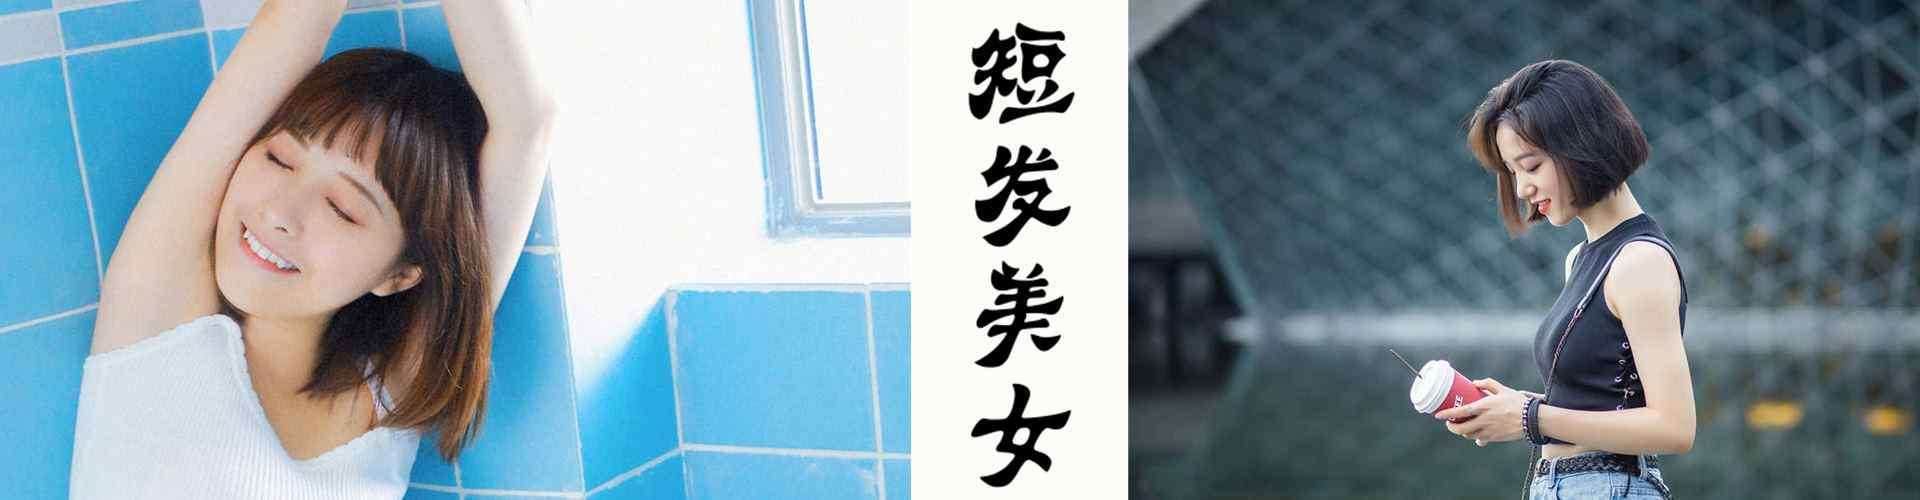 短發美(mei)女圖片_短發女明星圖片_小清新短發美(mei)女_美(mei)女私(si)房kong)脹計高(gao)清美(mei)女壁紙(zhi)